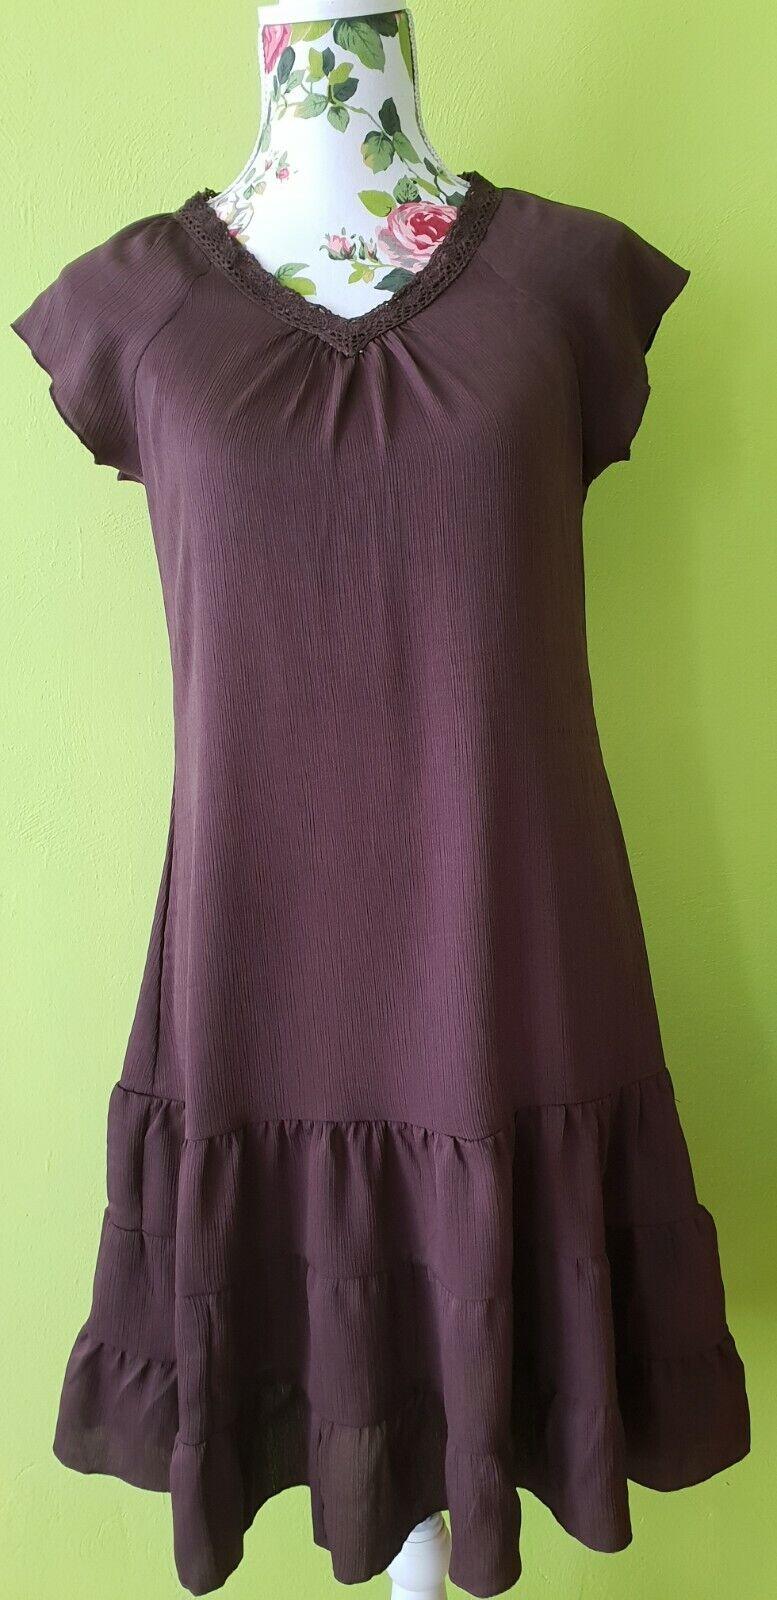 Ladies Mini Dress Brown Lace Size 36